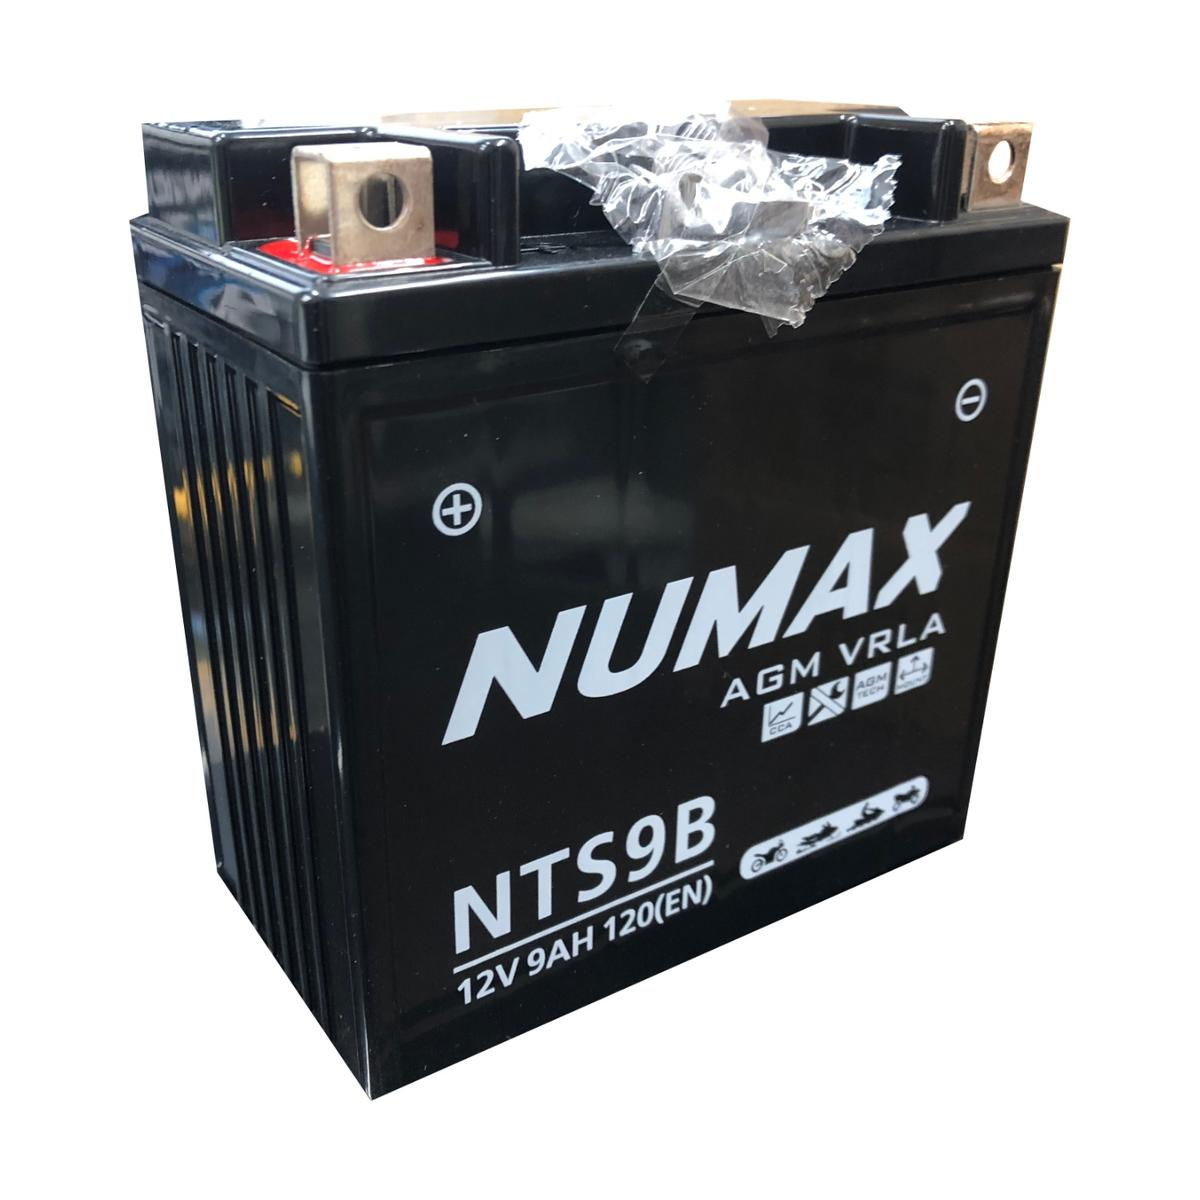 Numax NTS9B 12v Bike Motorbike Motorcycle Battery VESPA 125cc Free Style YB9L-B